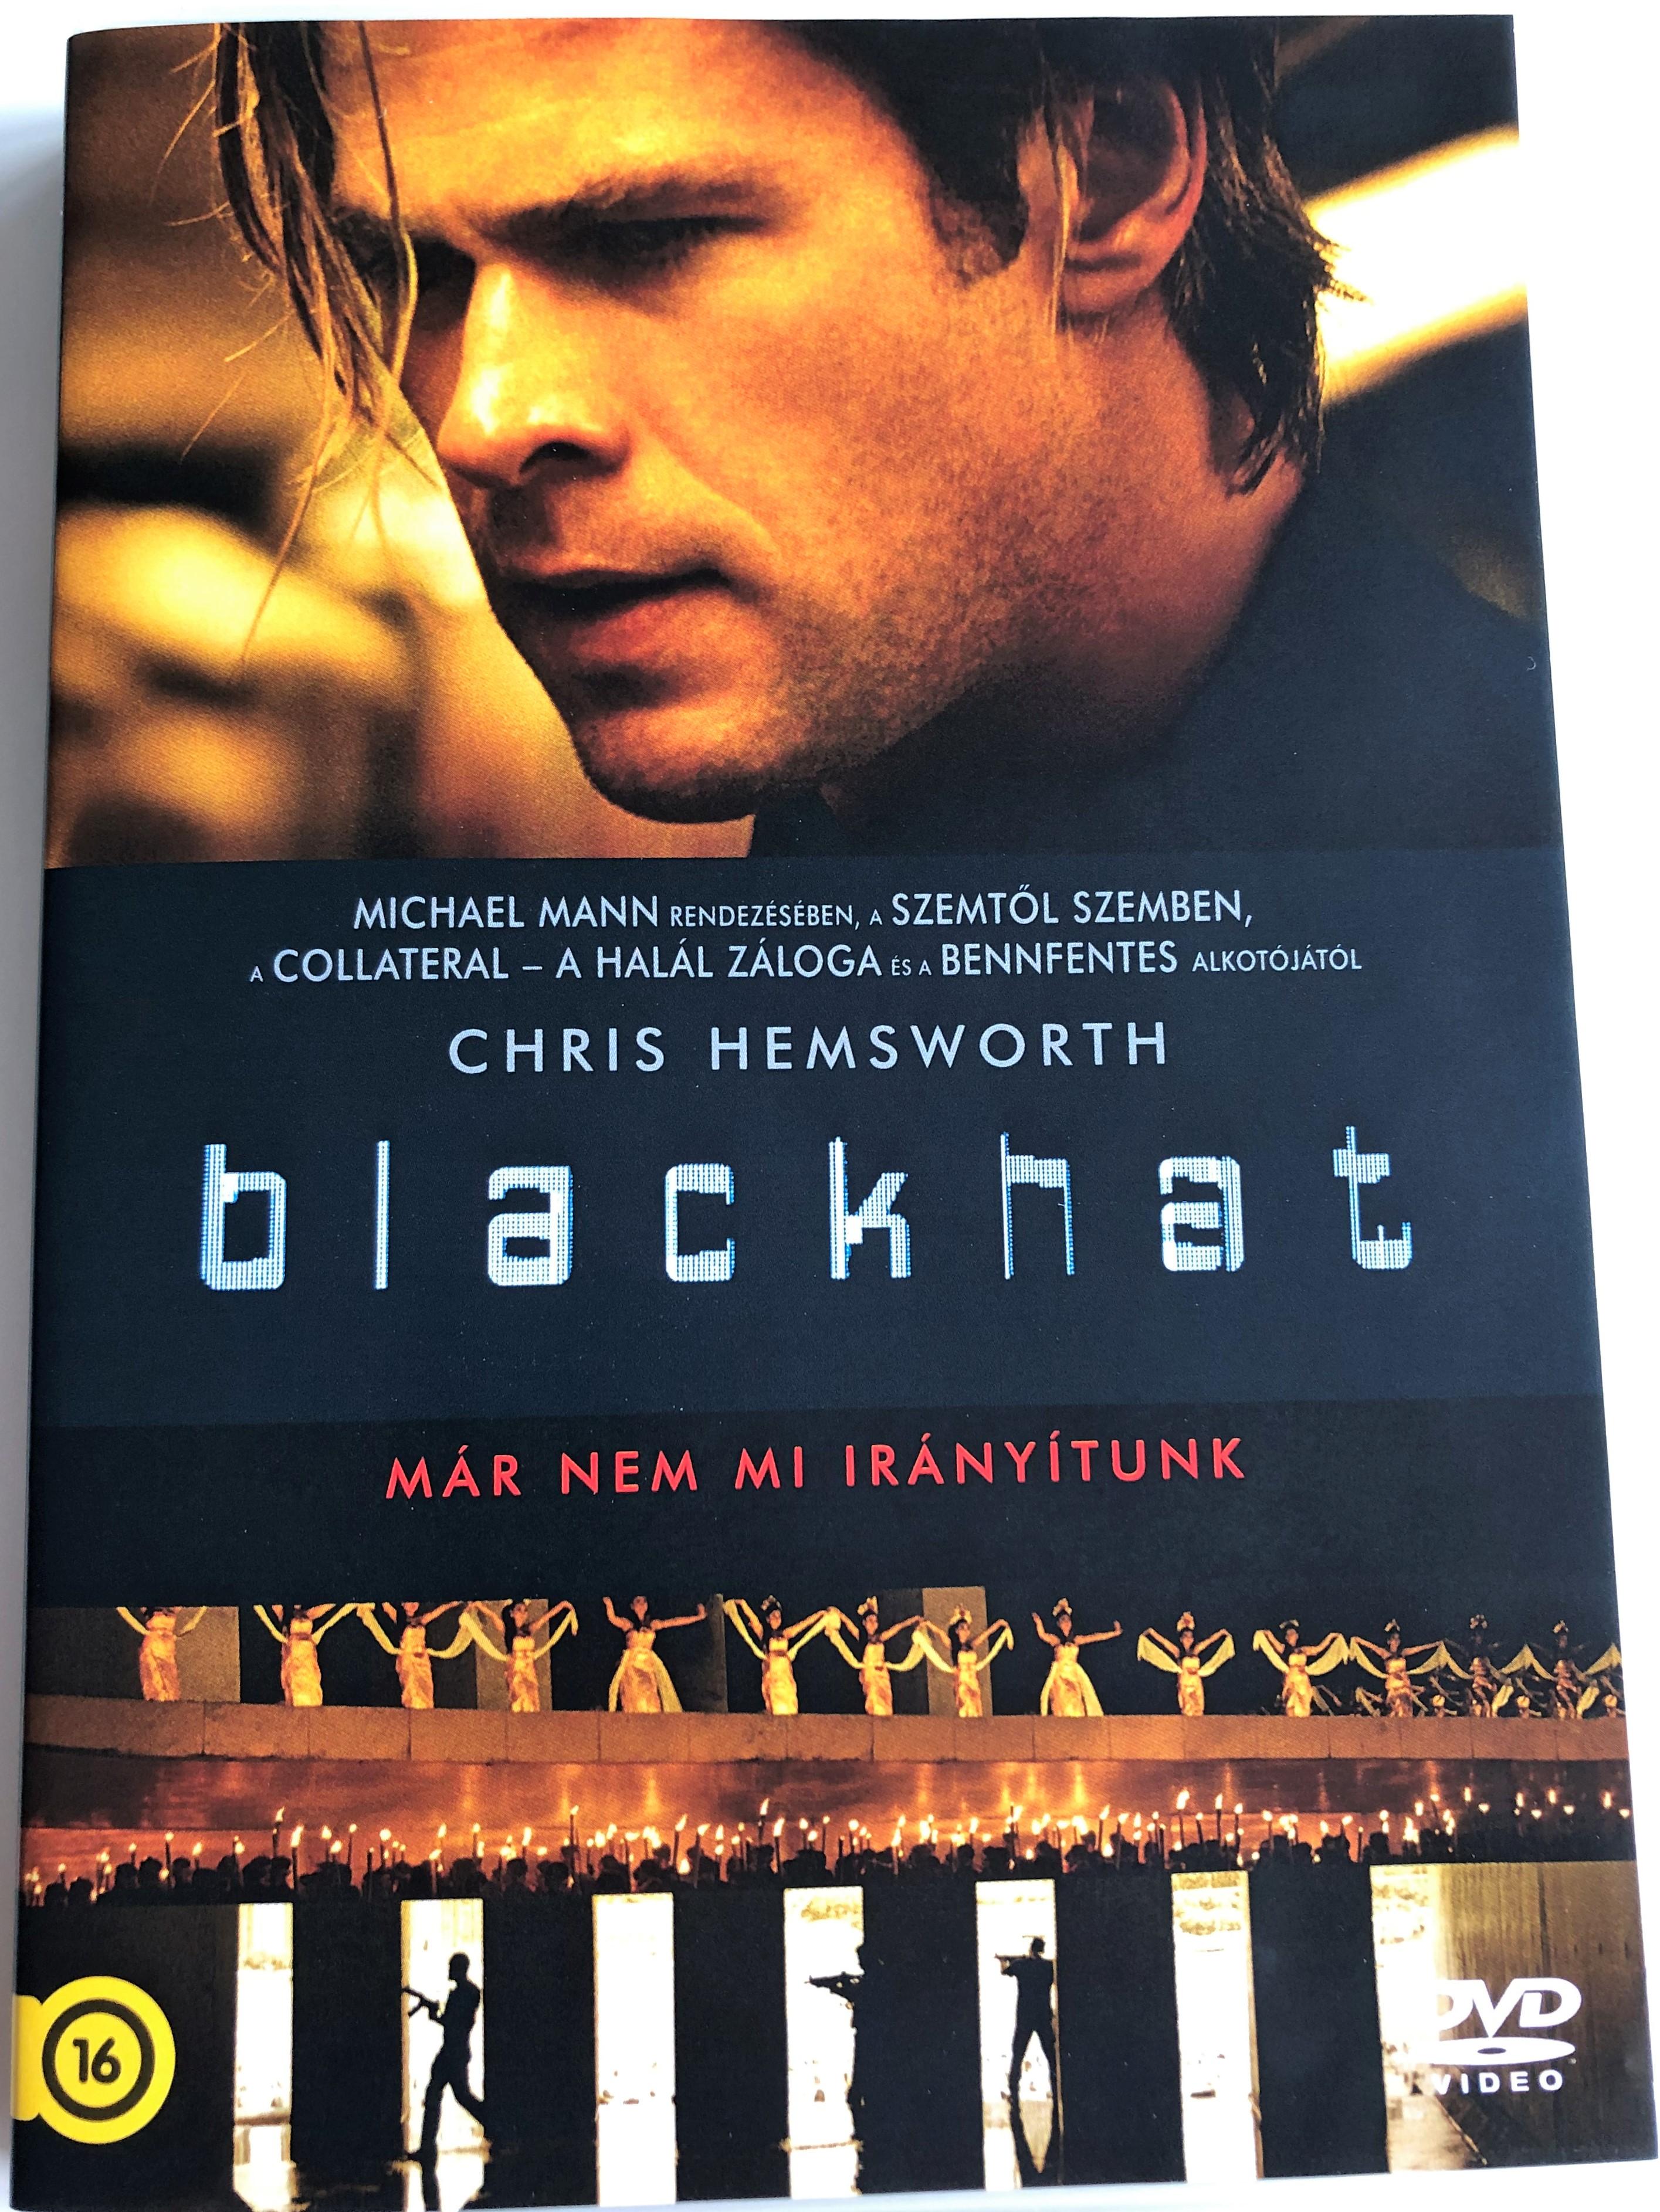 blackhat-dvd-2015-directed-by-michael-mann-starring-chris-hemsworth-tang-wei-viola-davis-ritchie-coster-holt-mccallany-yorick-van-wageningen-wang-leehom-1-.jpg